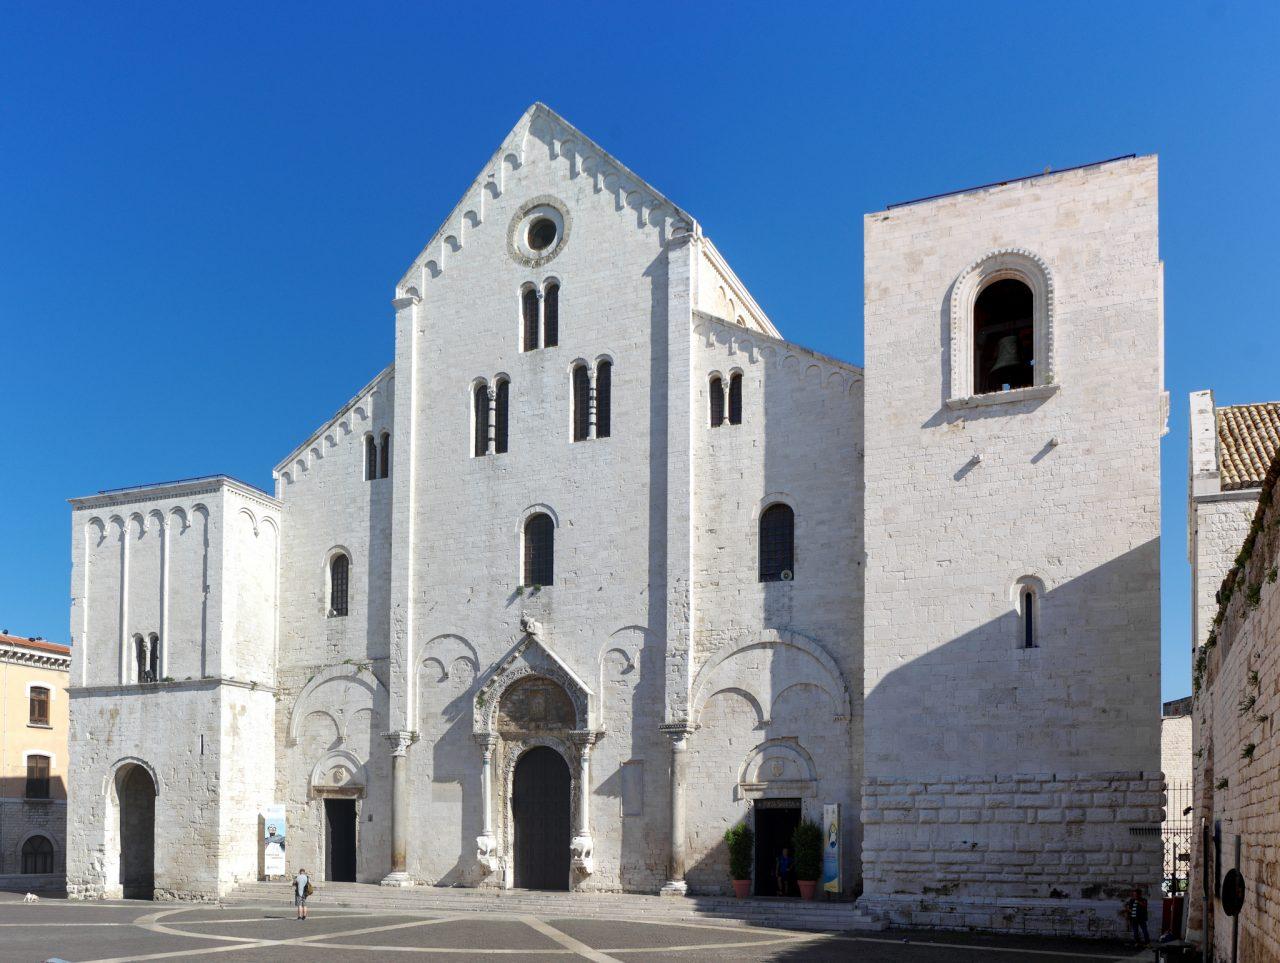 Базилика Святого Николая (Basilica di San Nicola)